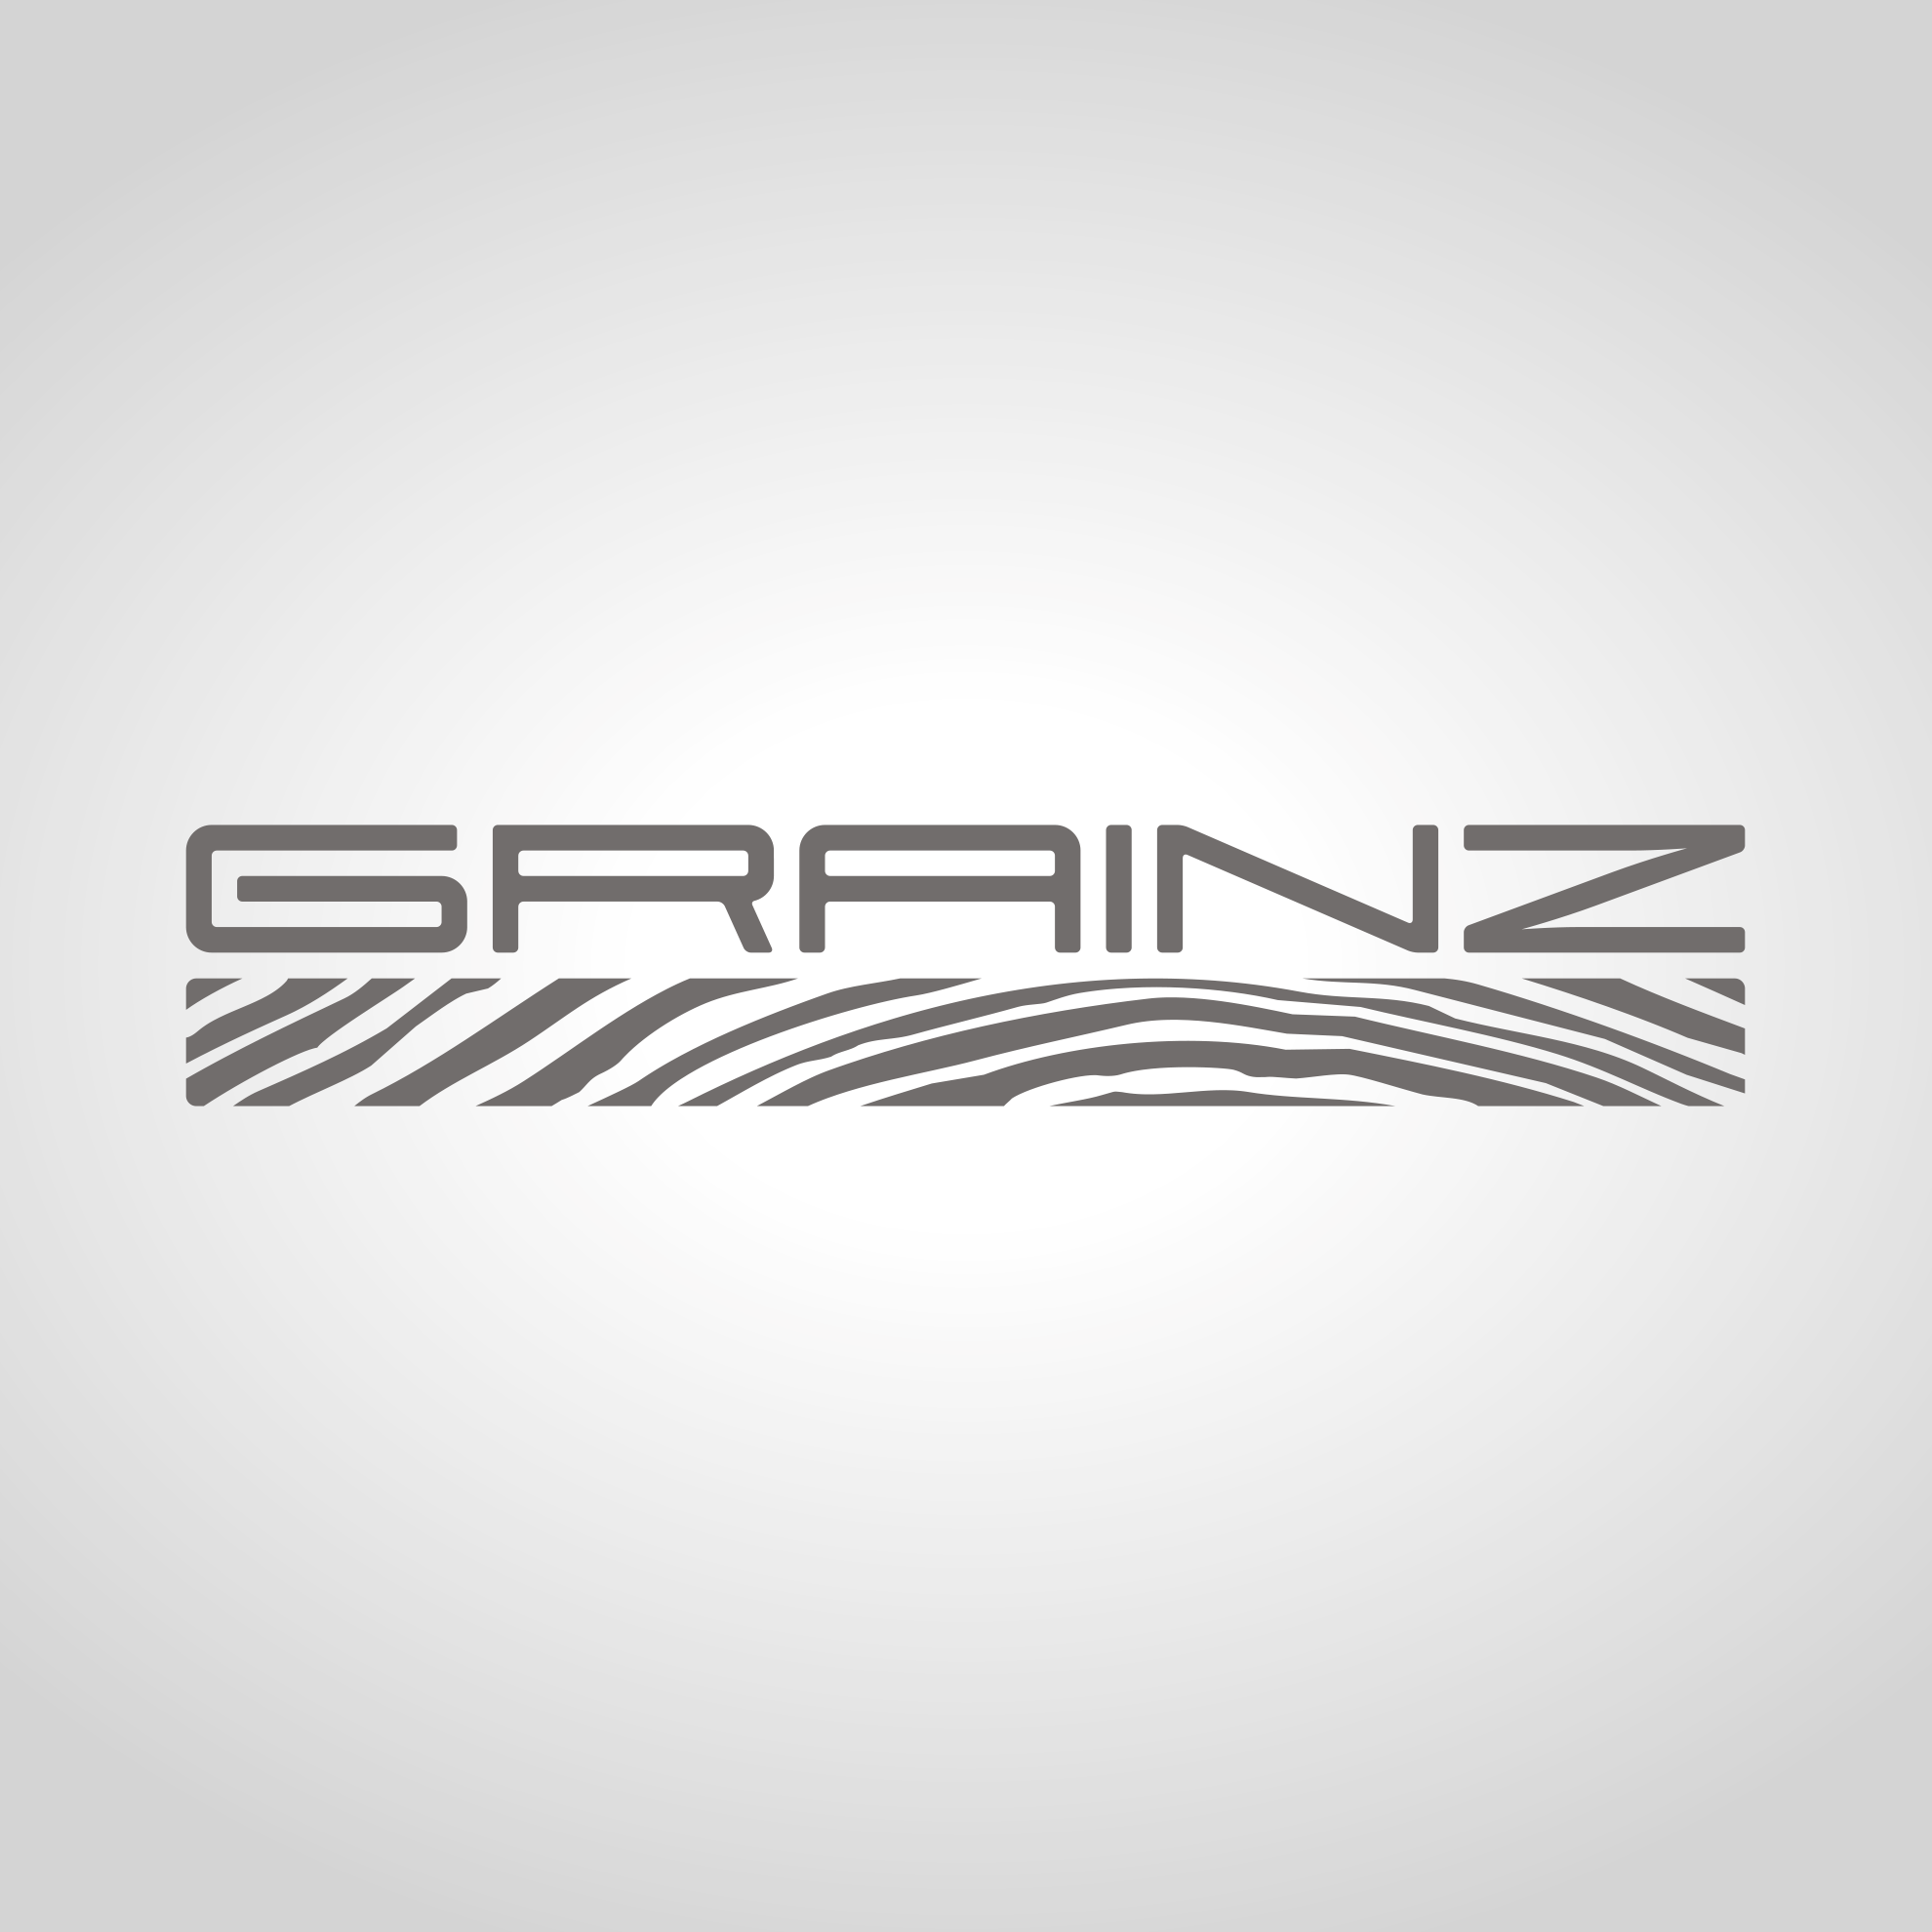 grainz | Grainz logo